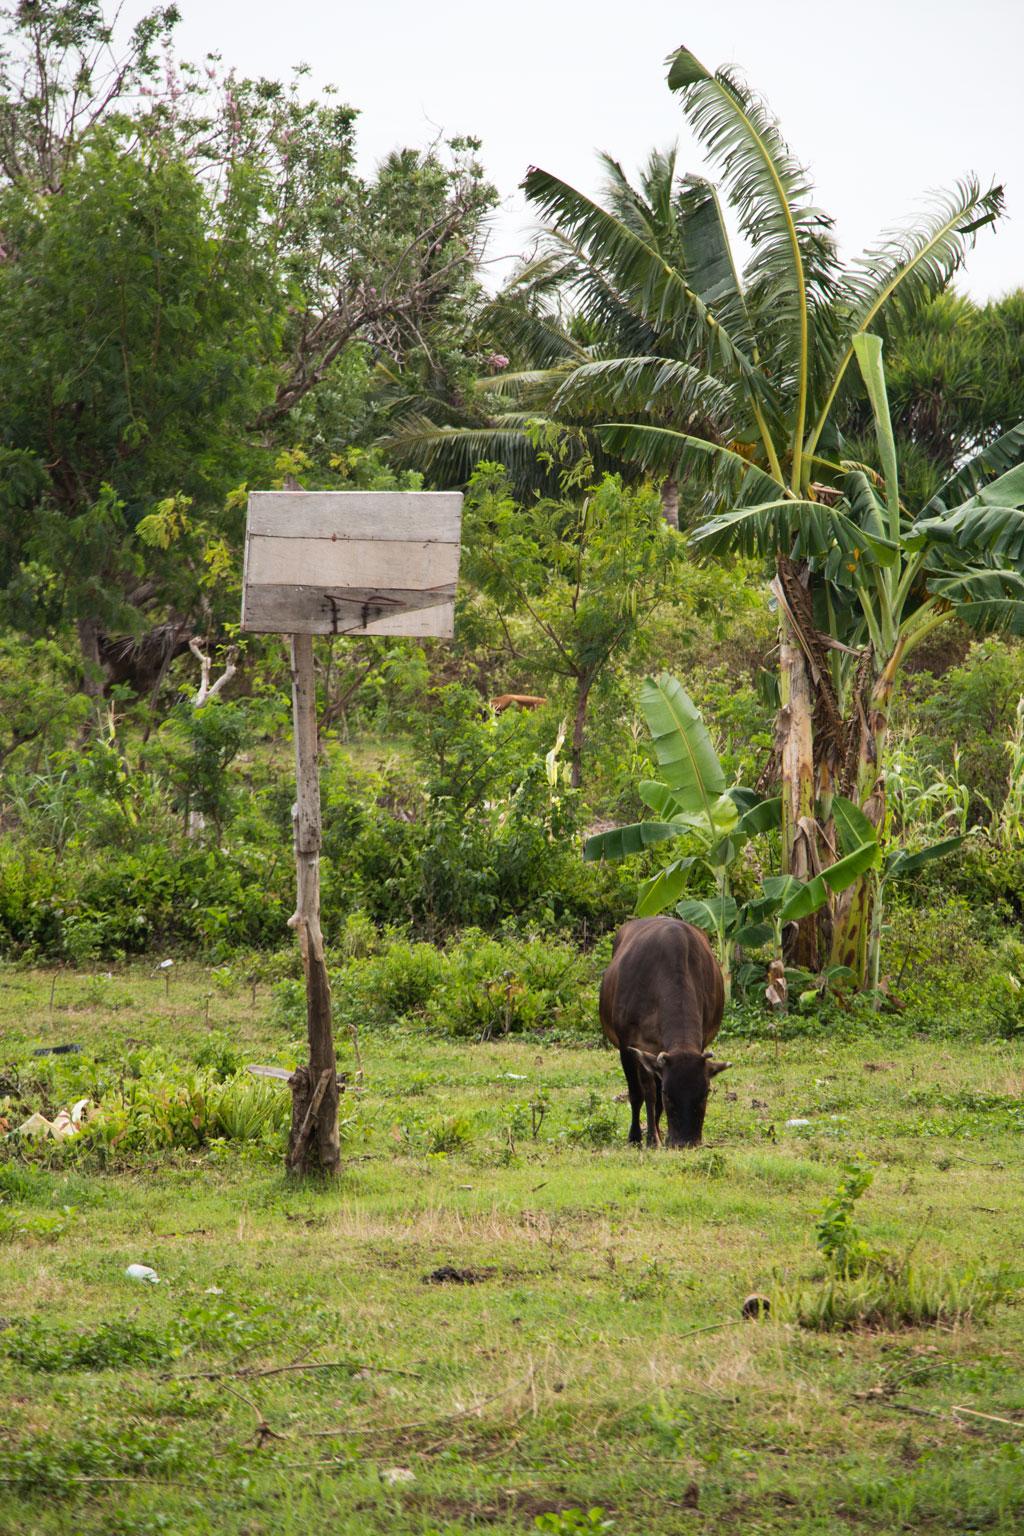 Pamilacan Island – Kuh steht neben Basketballkorb | SOMEWHERE ELSE